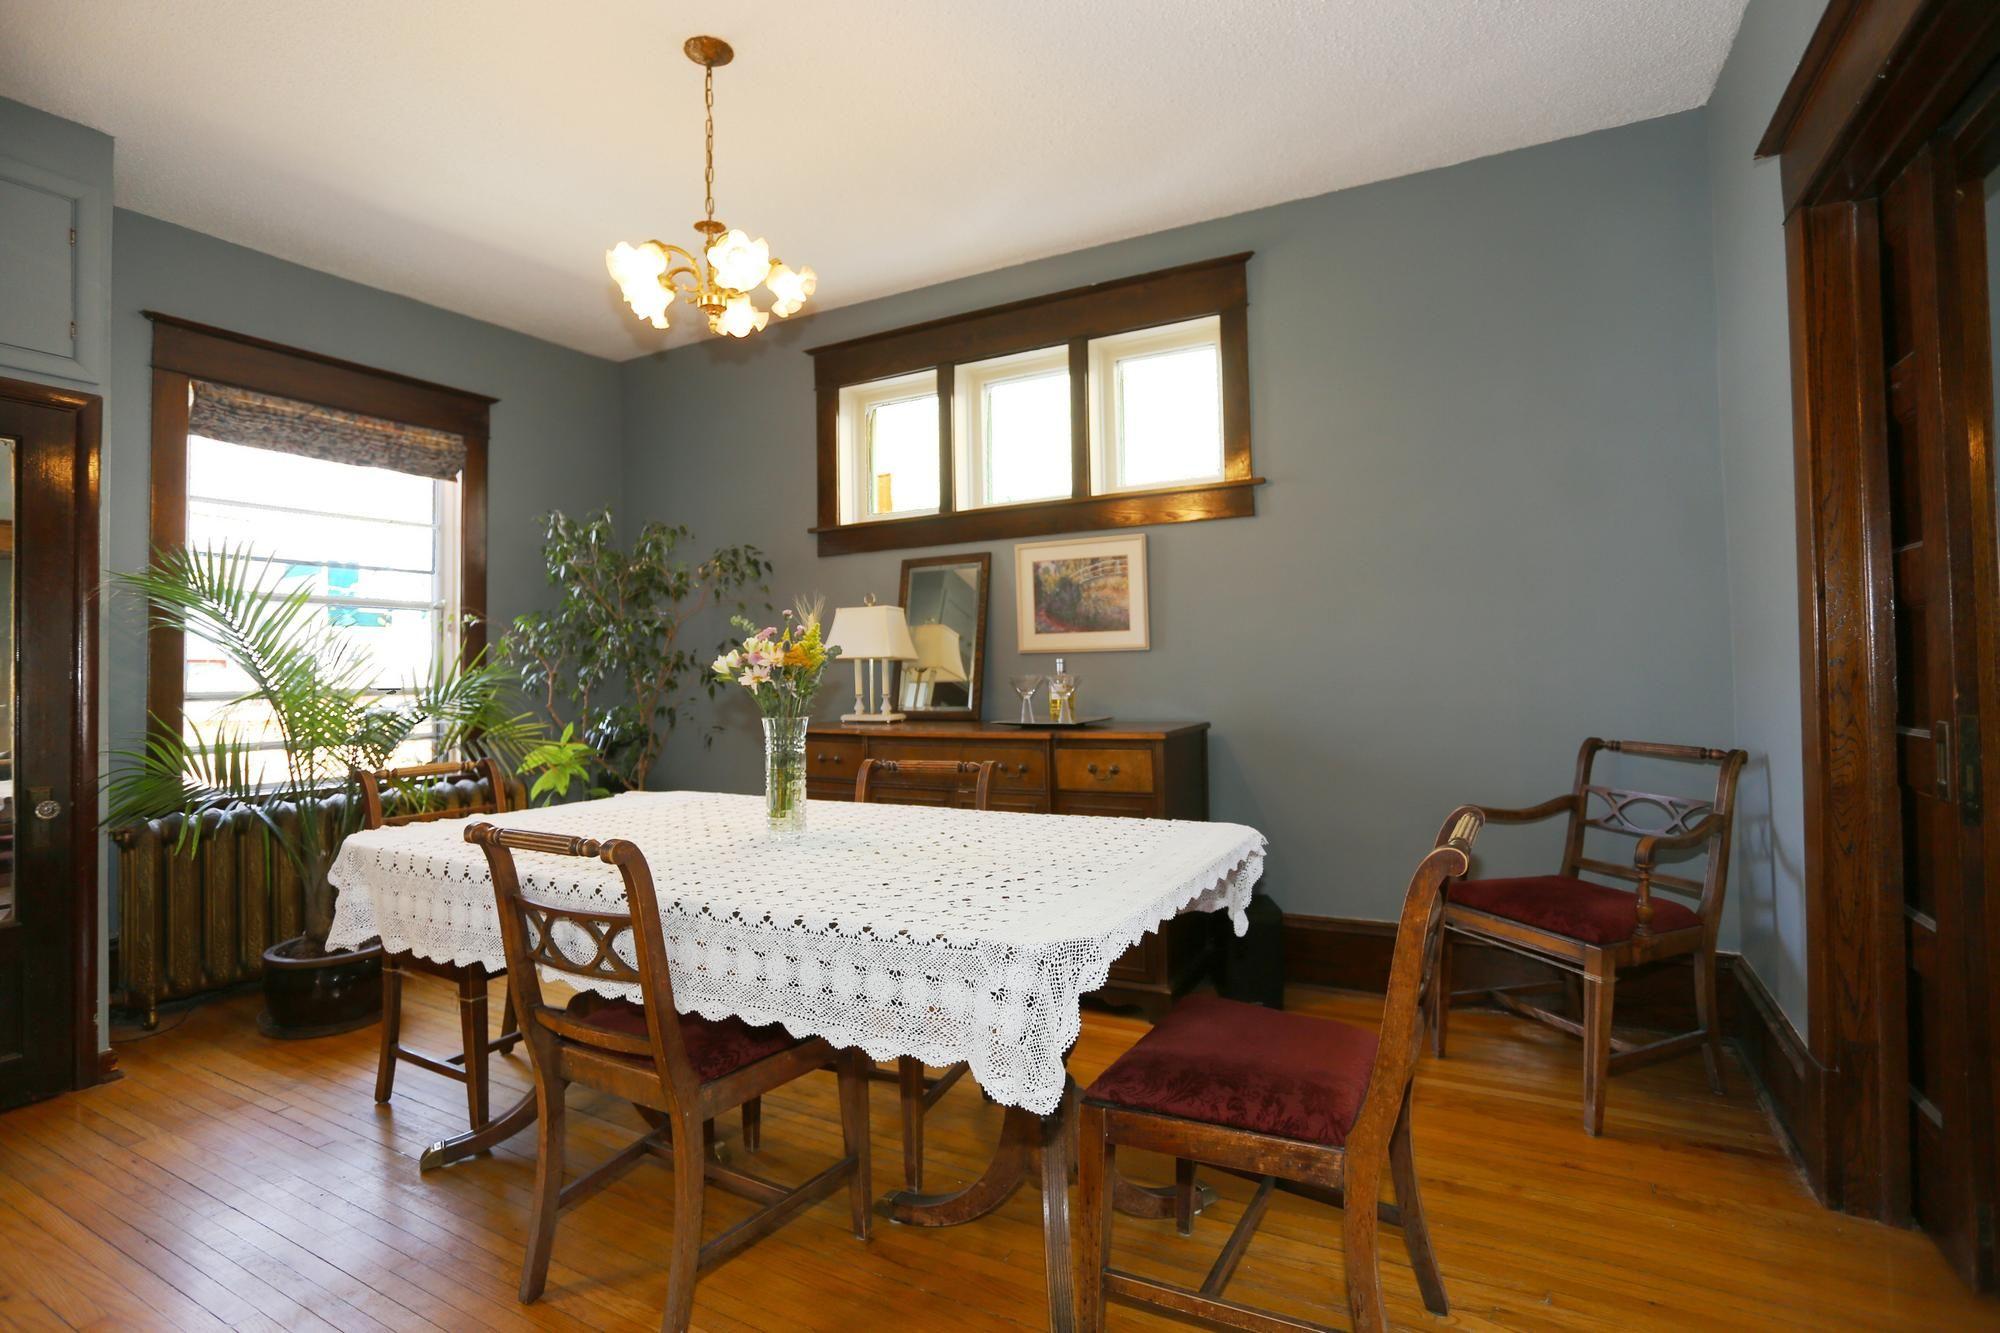 Photo 8: Photos: 96 Home Street in Winnipeg: Wolseley Single Family Detached for sale (5B)  : MLS®# 1810985